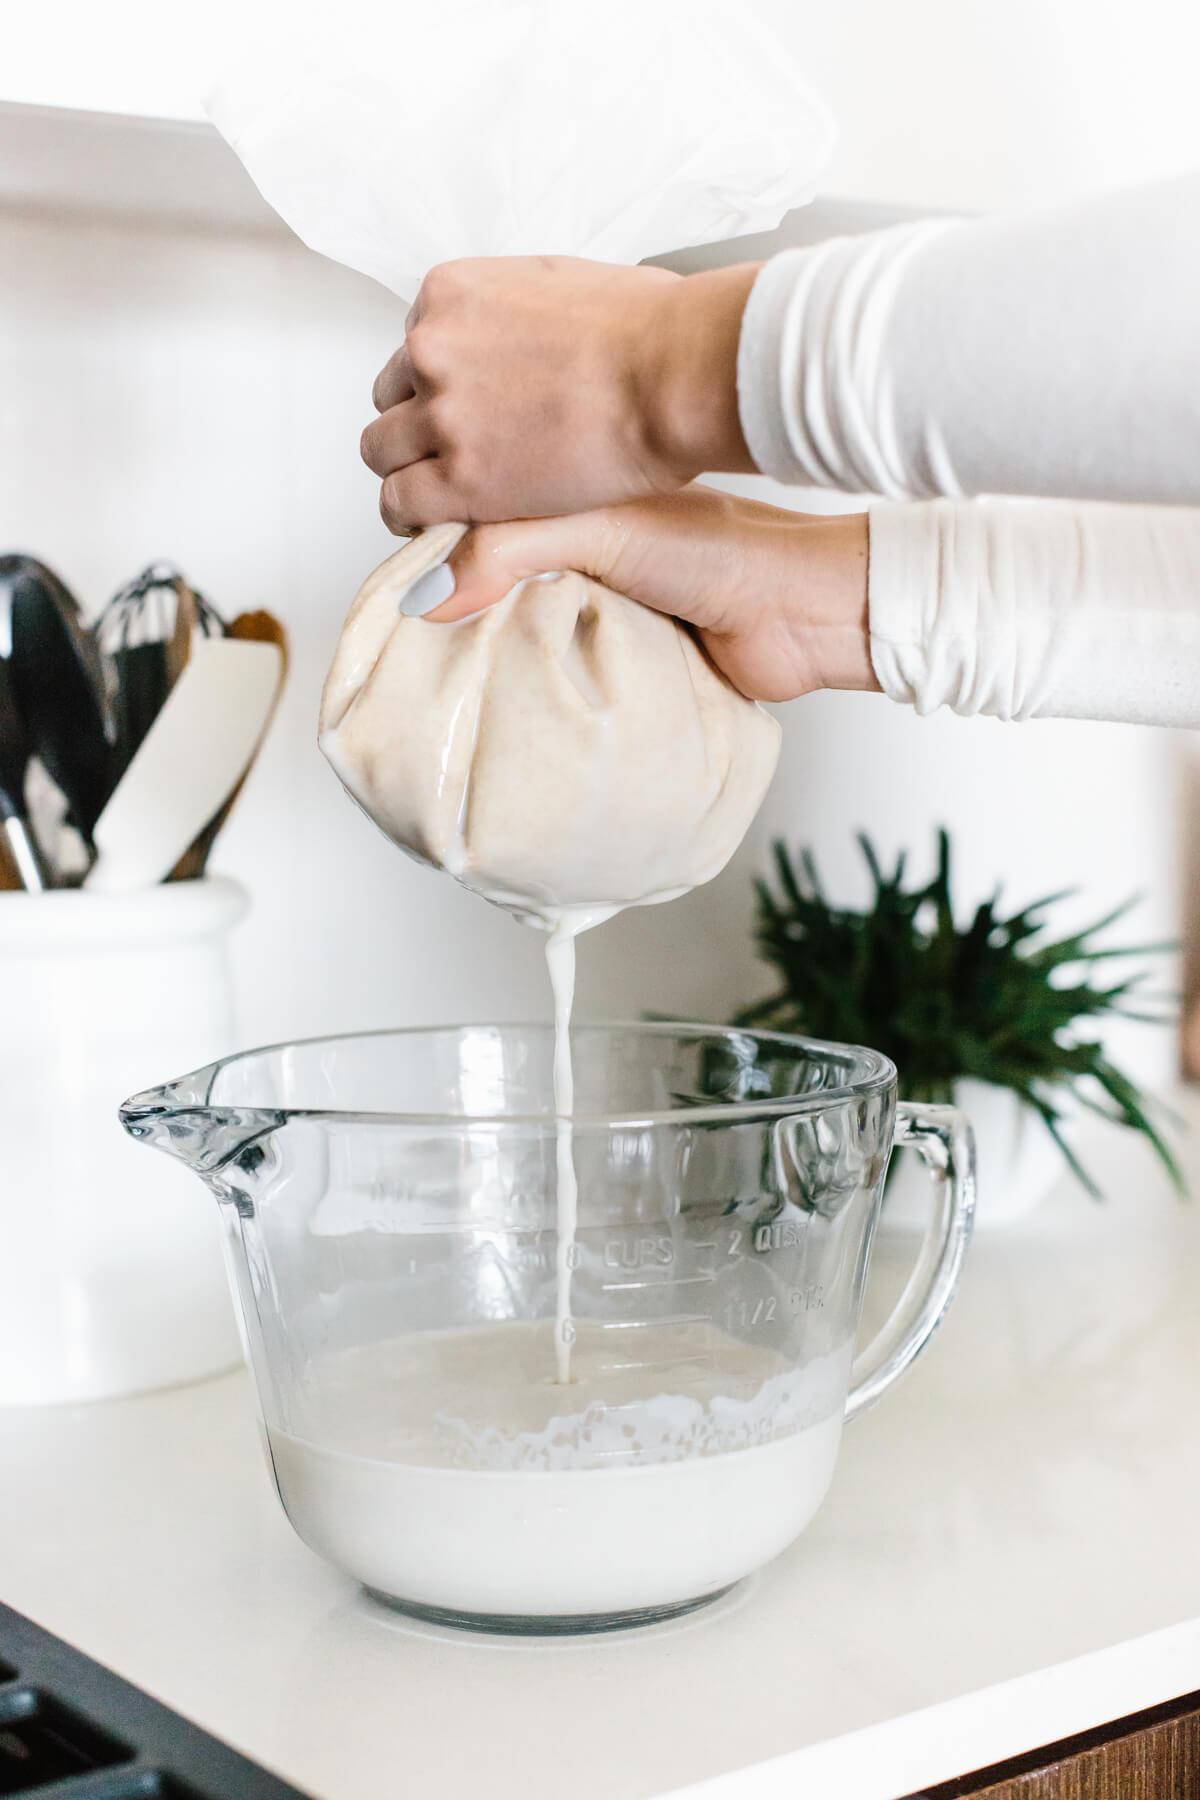 Straining oat milk recipe.